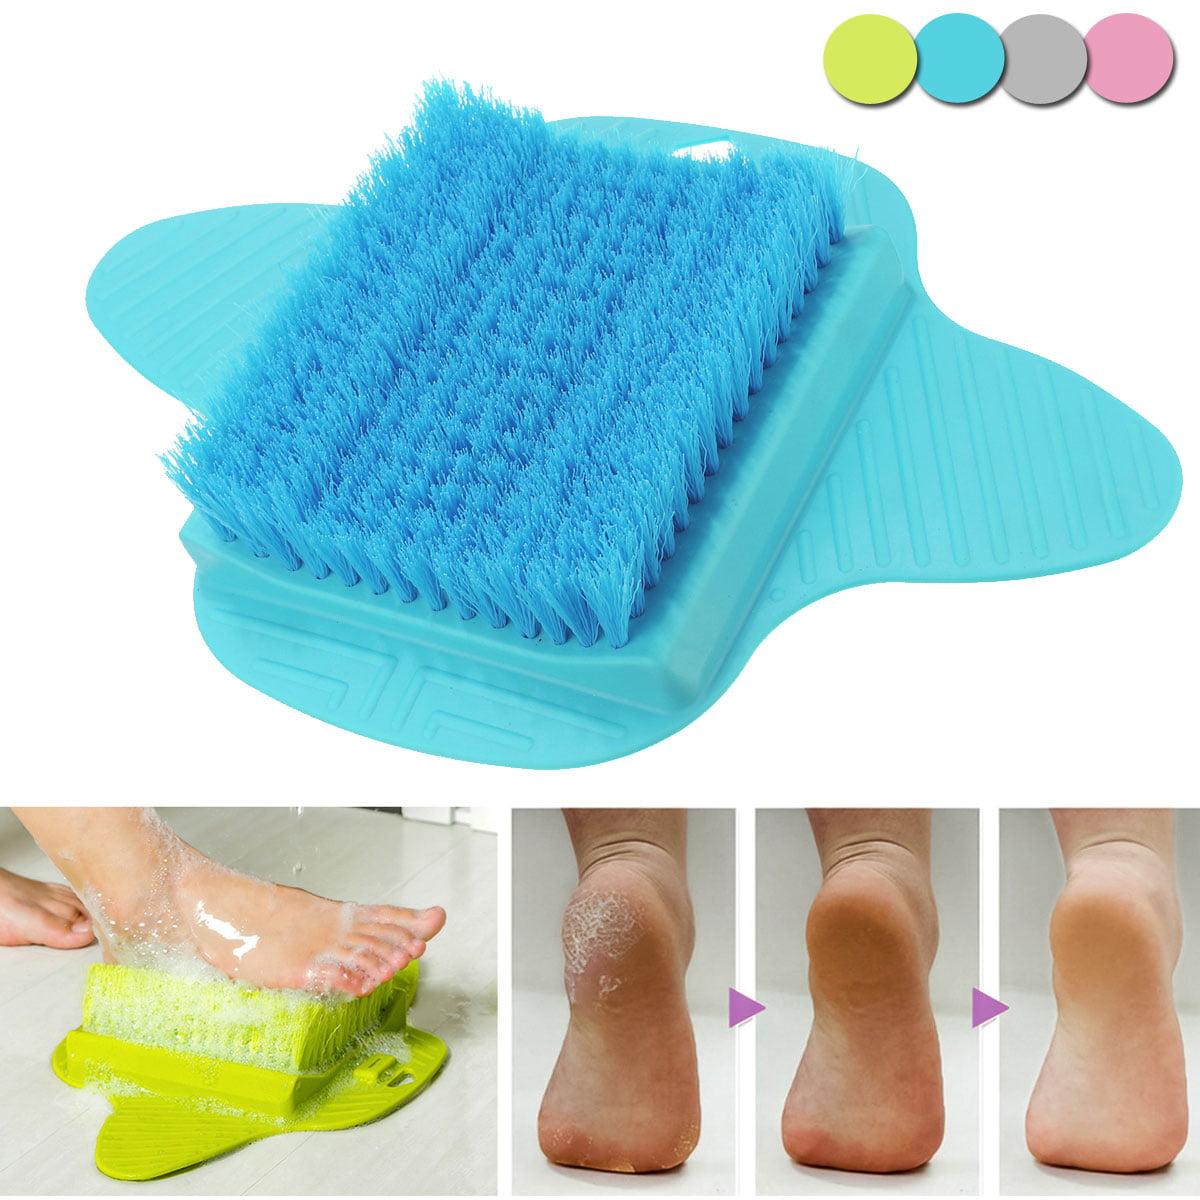 Bath Foot Scrub Brush Exfoliating Shower Feet Scrubber Cleaner Washer Spa Massage Brush